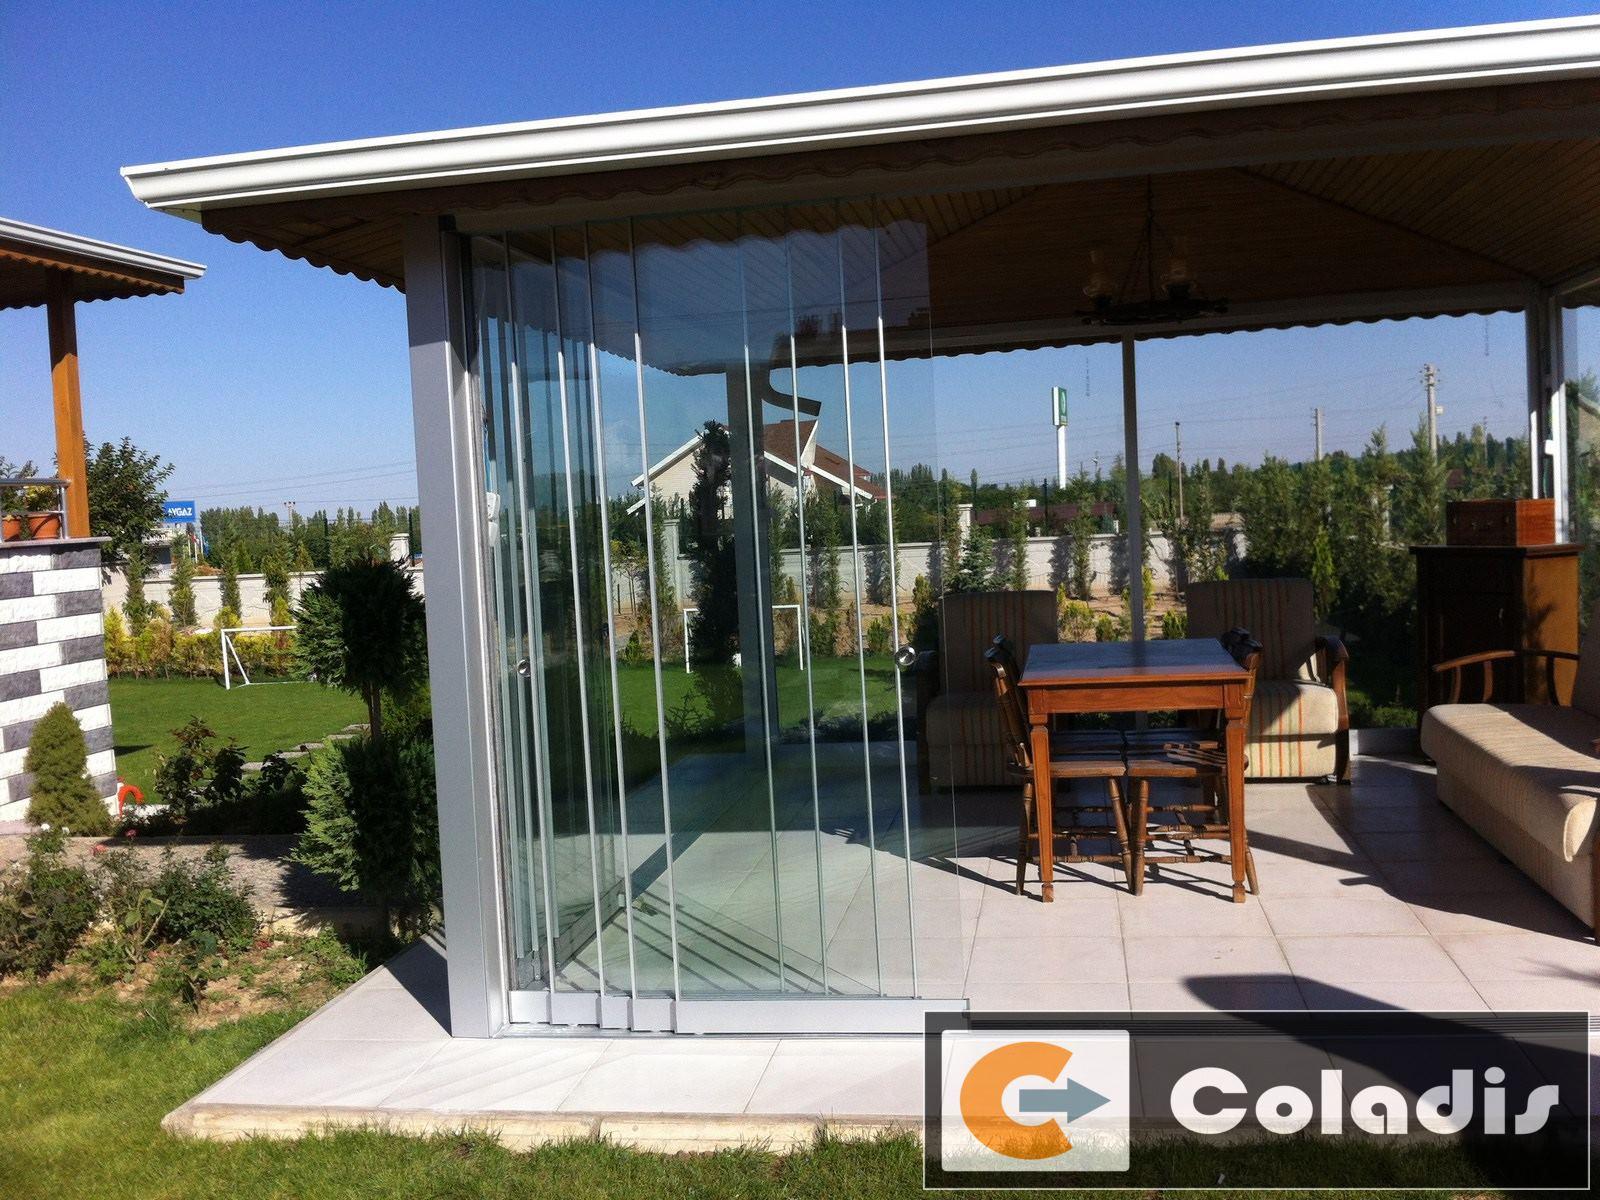 fermeture verre veranda coladis Béziers hérault 34